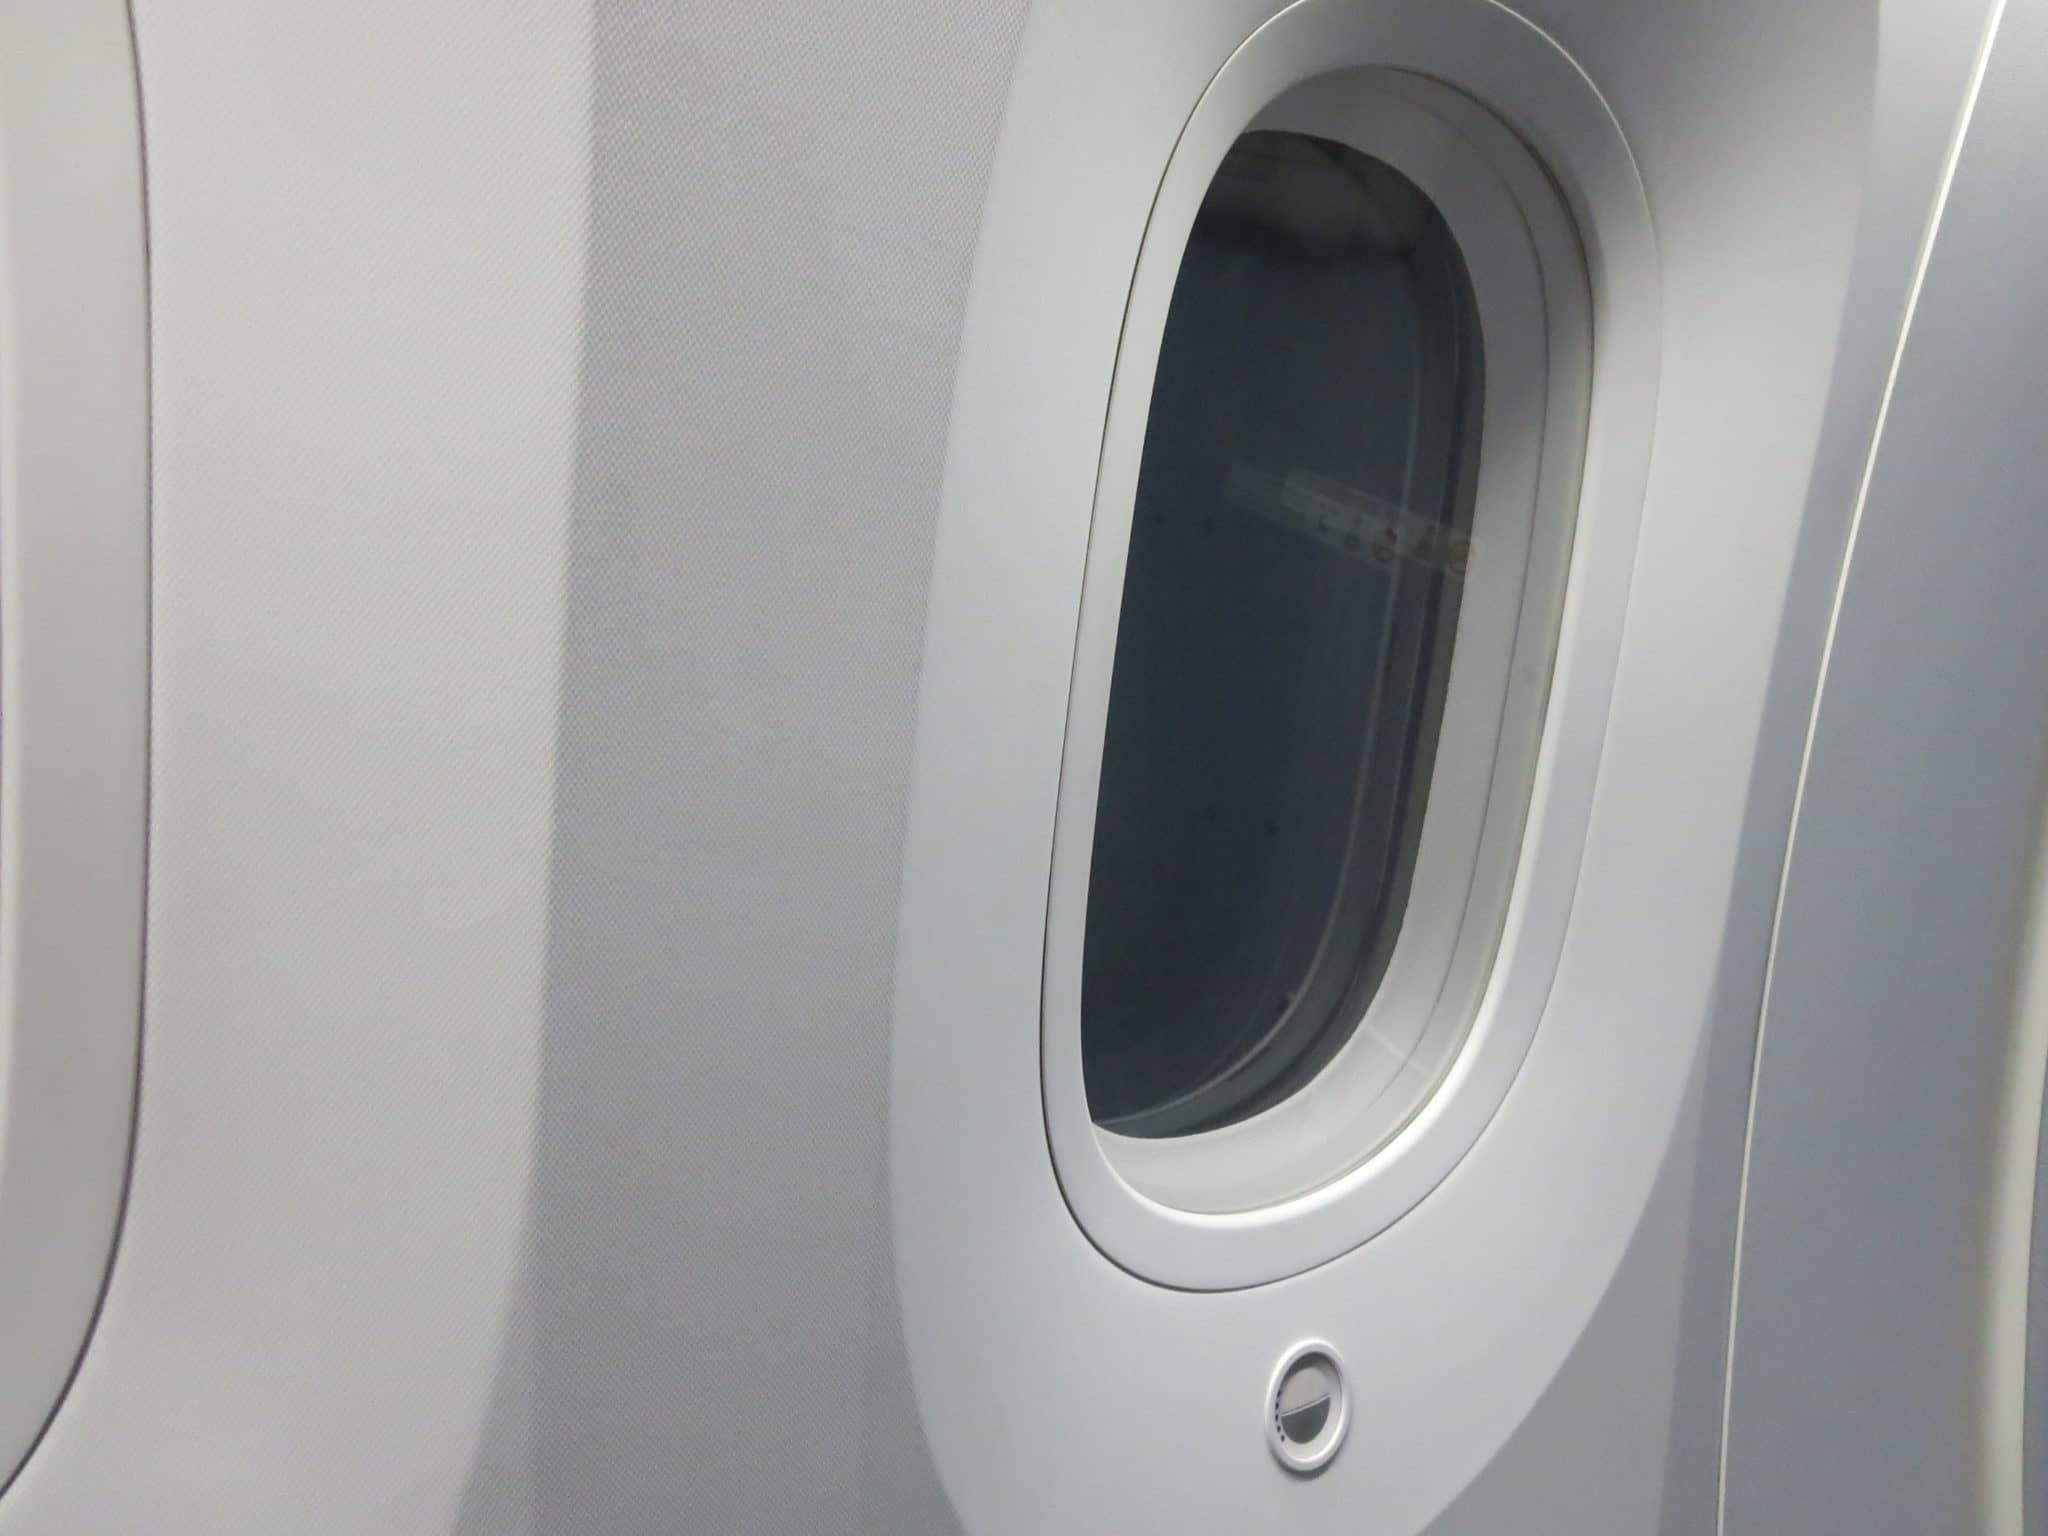 ANA Business Class Boeing 787-8 Fenster